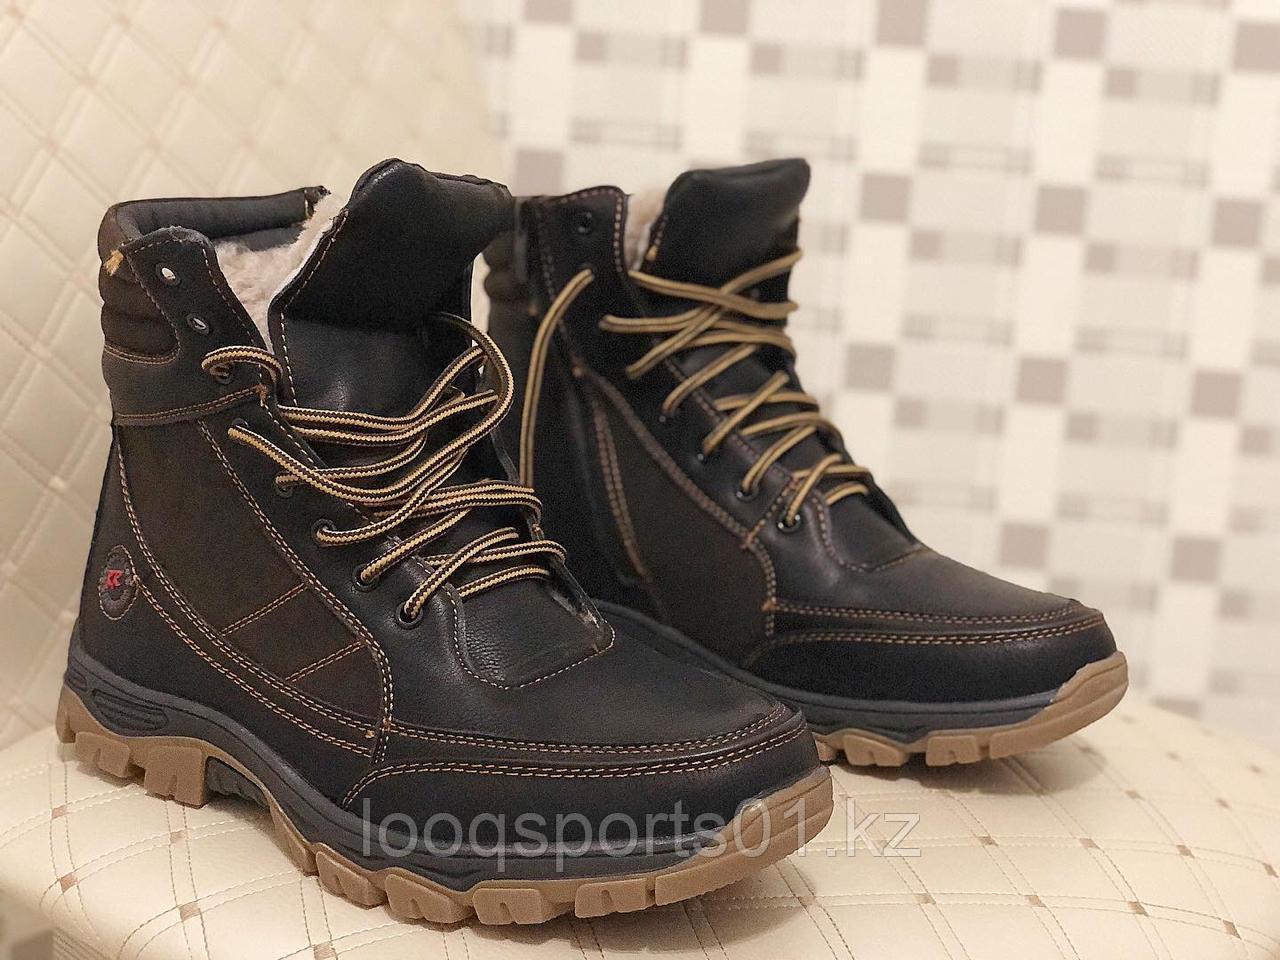 Ботинки зимние обувь - фото 1